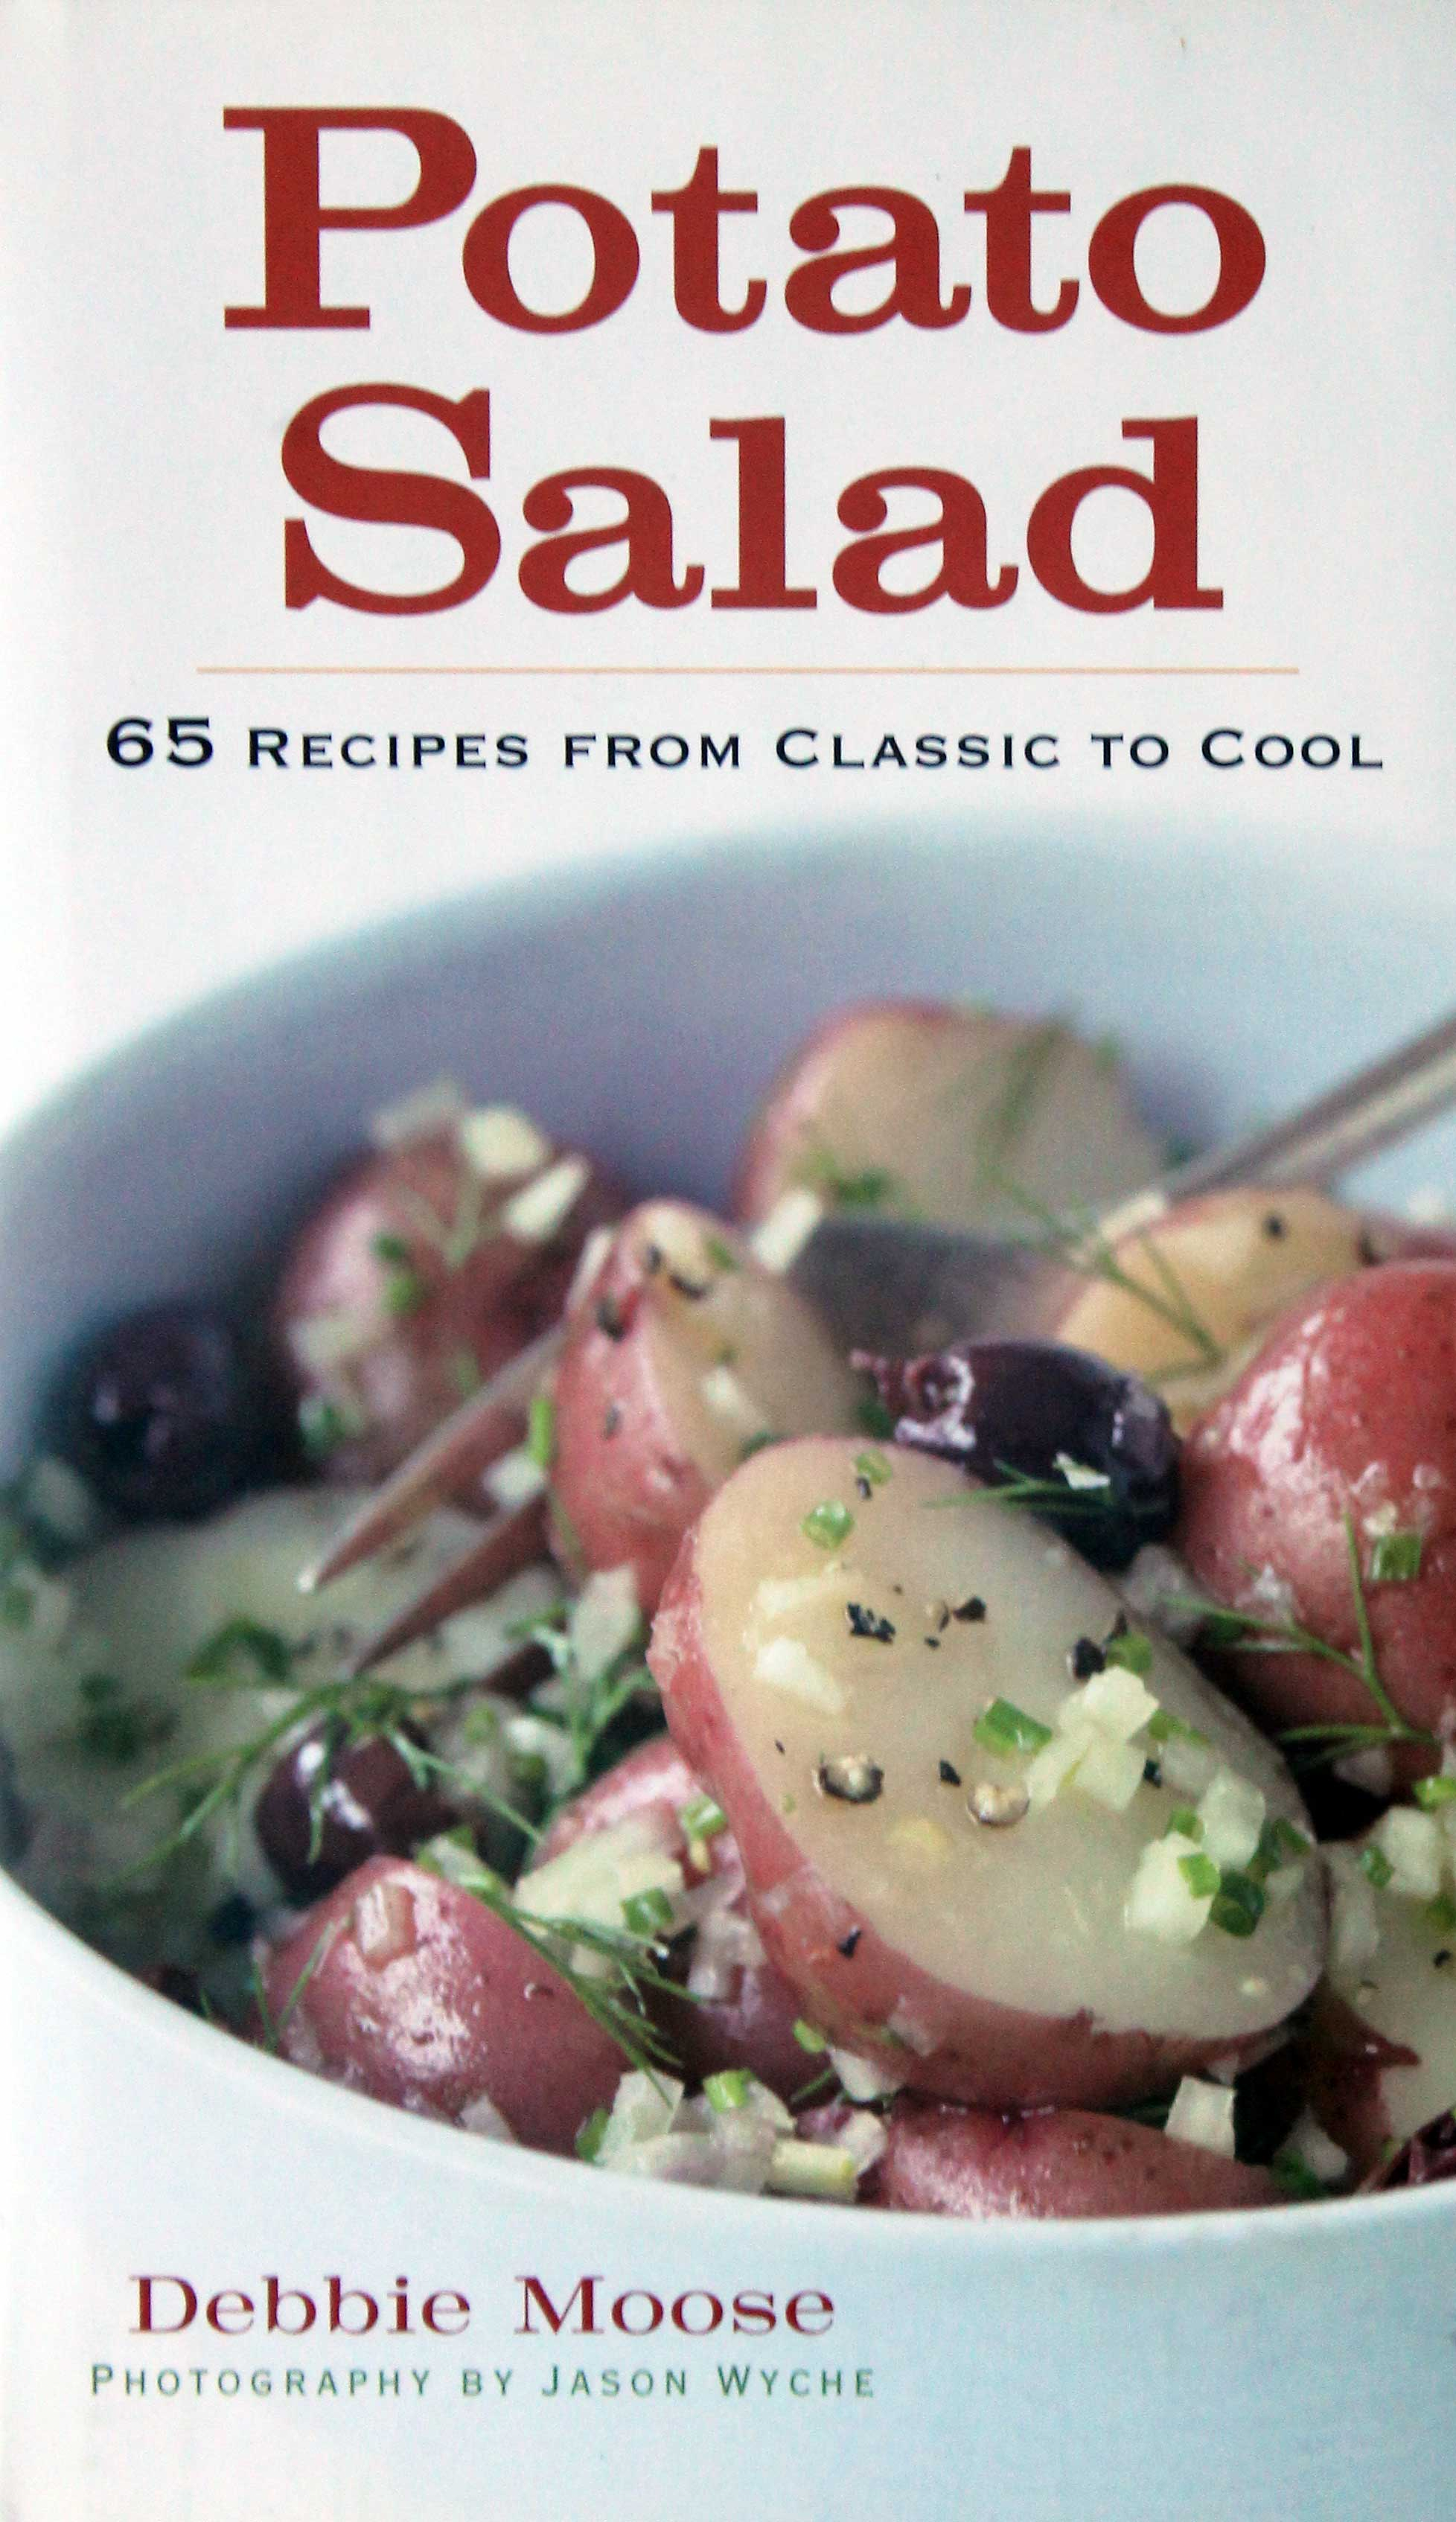 Best of Cookbook Reviews: Potato Salad by Debbie Moose